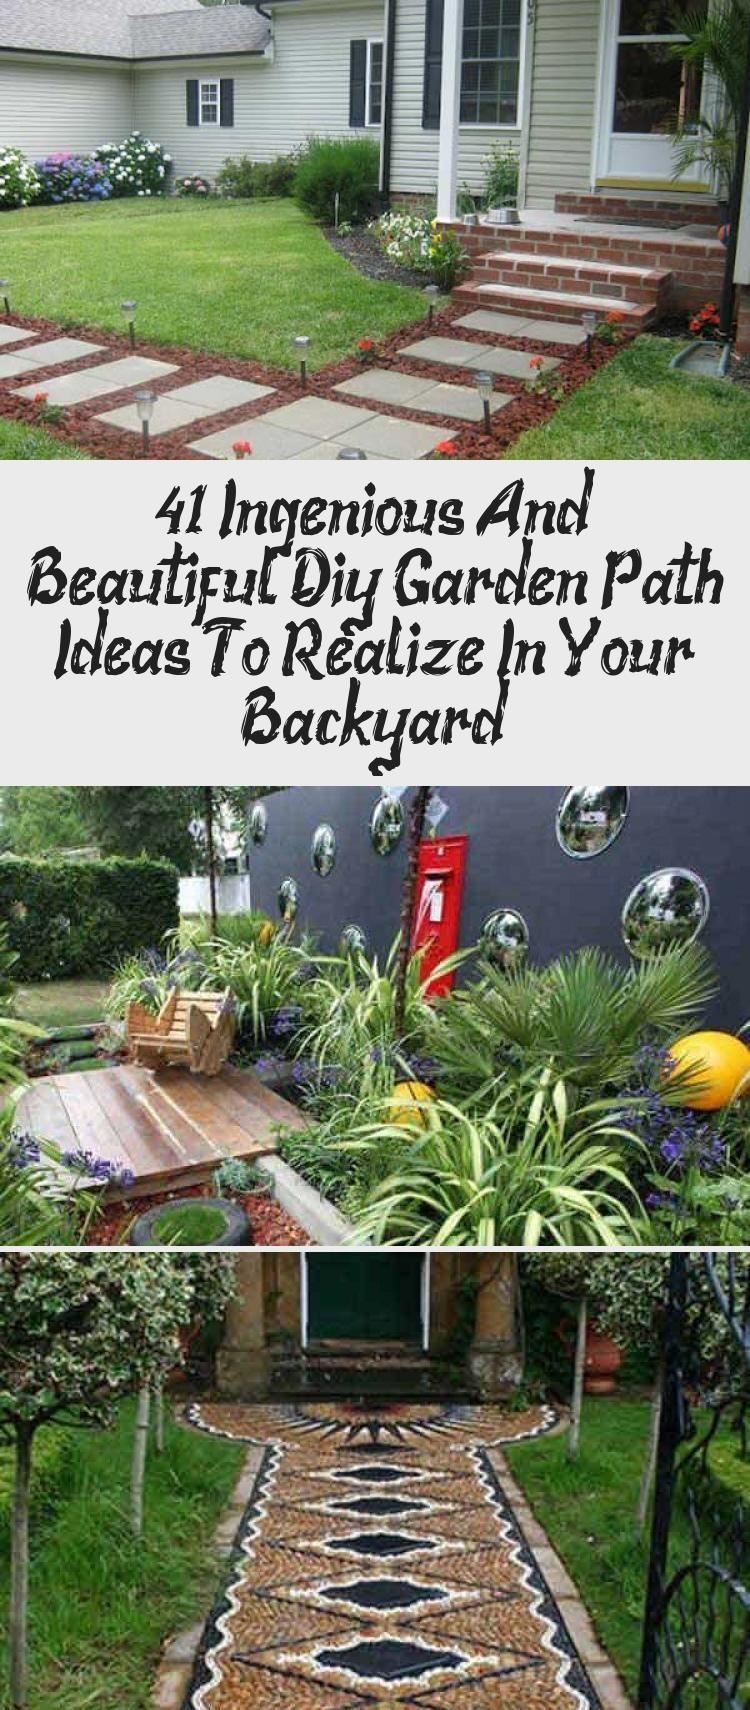 Photo of 41 Ingenious And Beautiful Diy Garden Path Ideas To Realize In Your Backyard – GARDEN